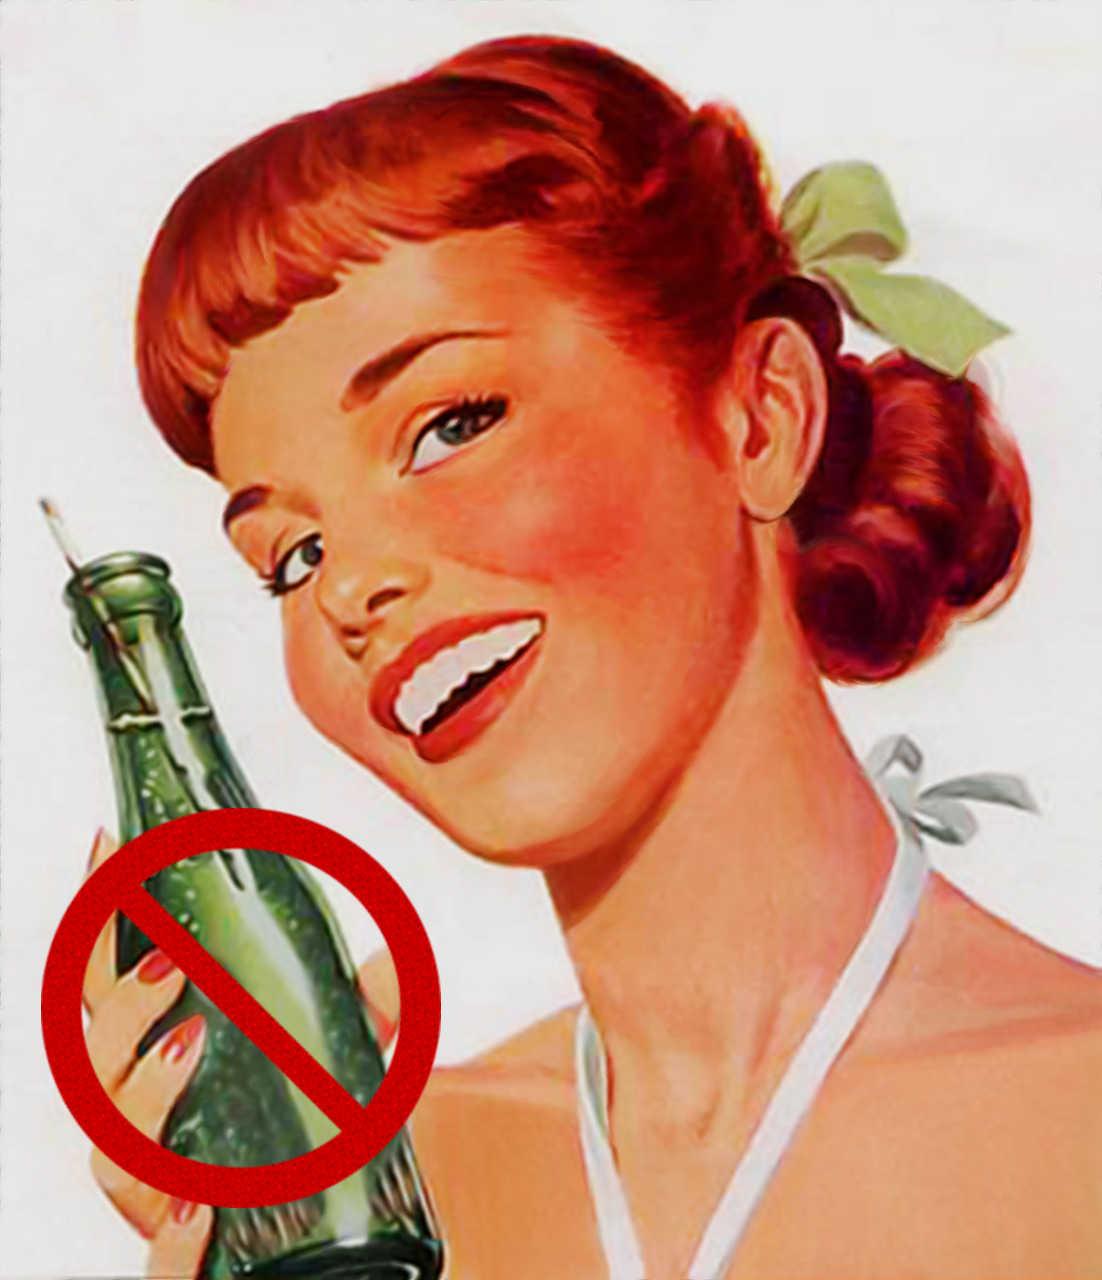 Old School Don't Drink Soda Ad